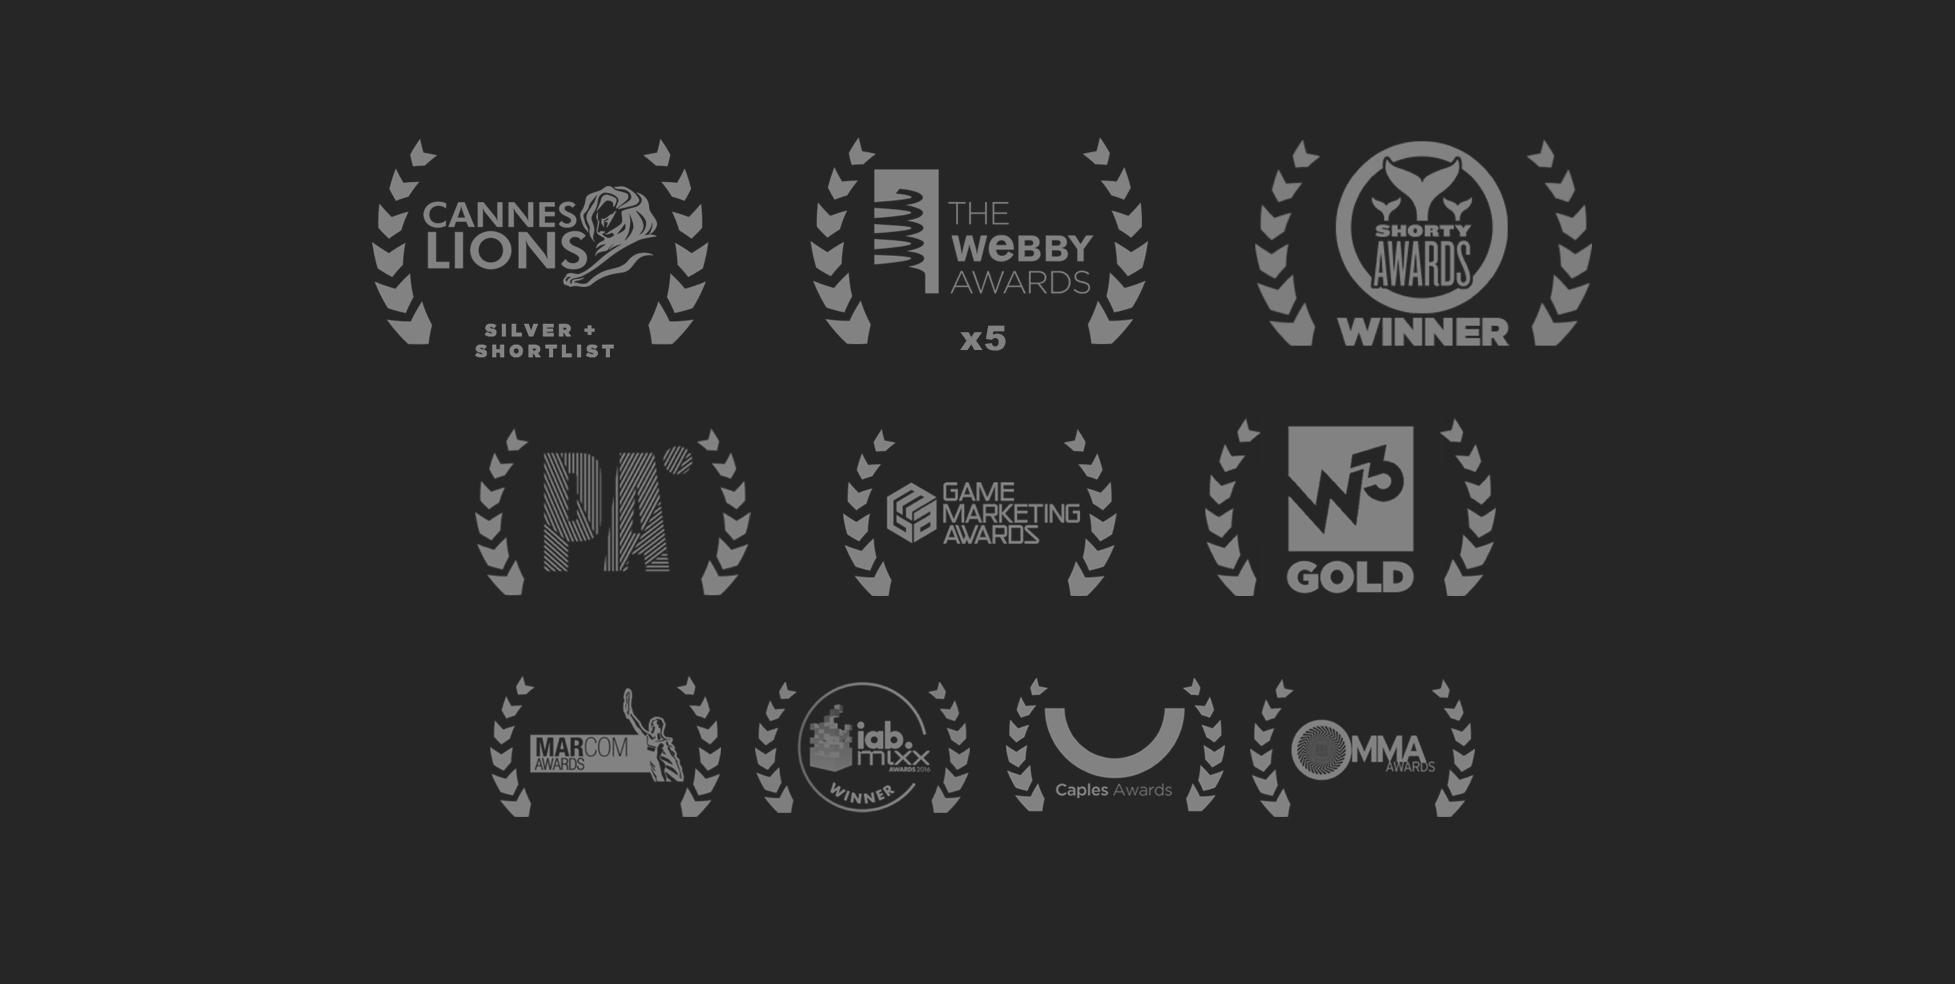 notdanmartin_Awards_02.jpg